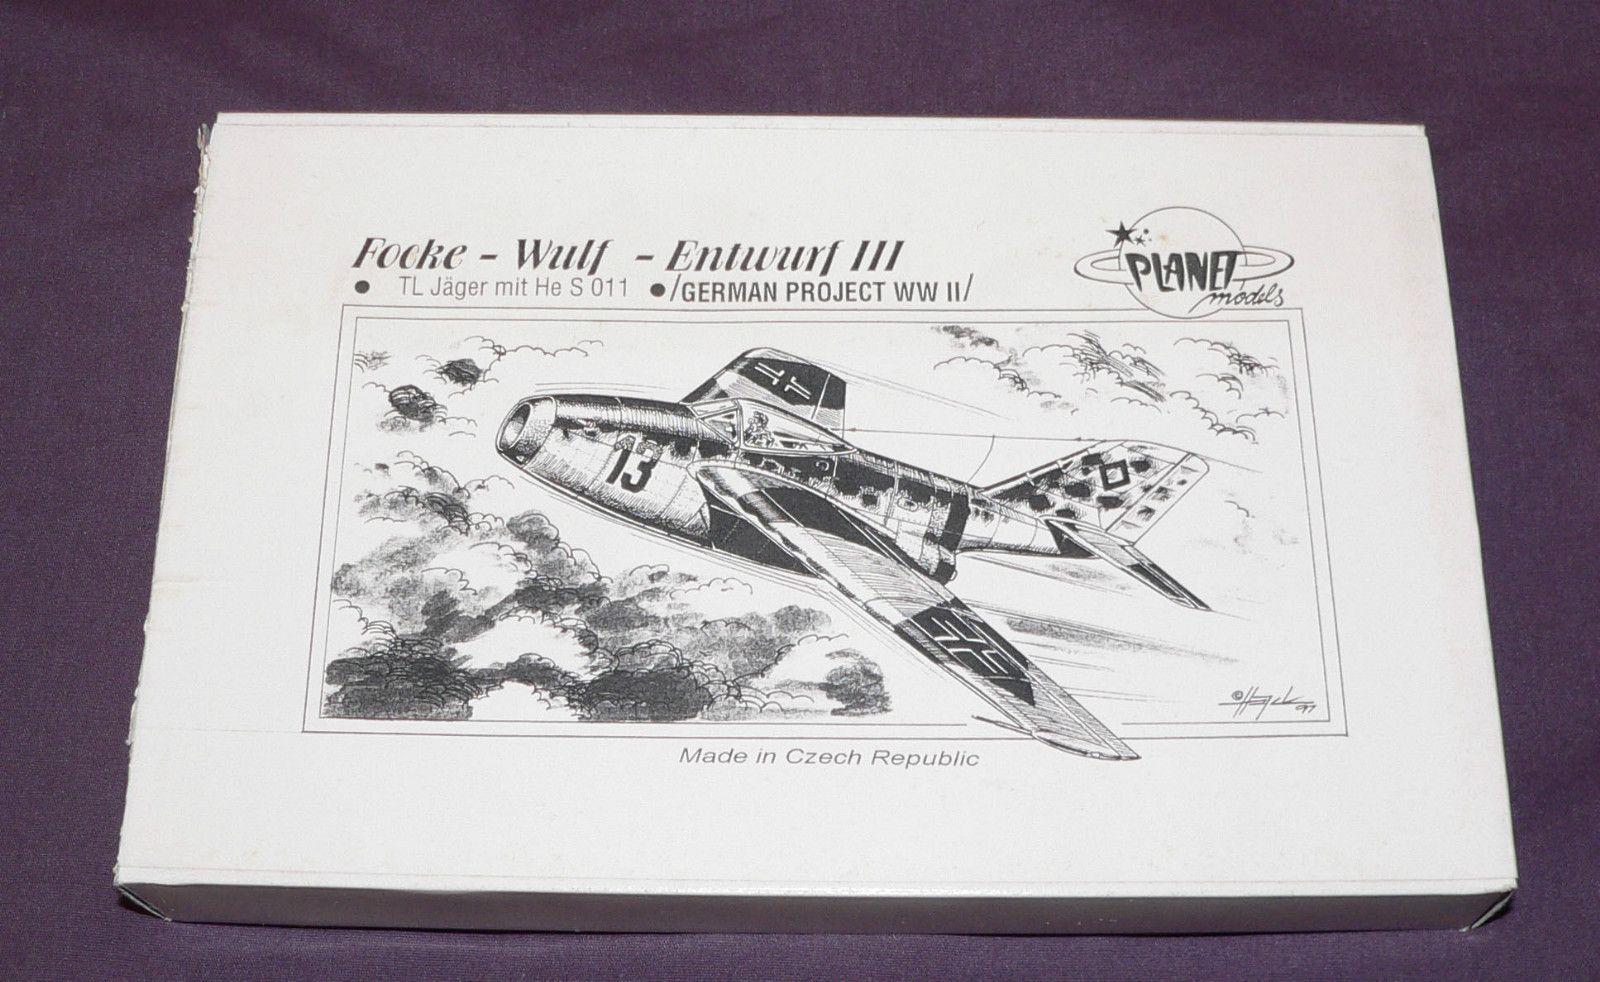 1 72 Planet Models Entwurf III TL Jager Mit He s 011 LUFT46 Luftwaffe Jetfighter | eBay